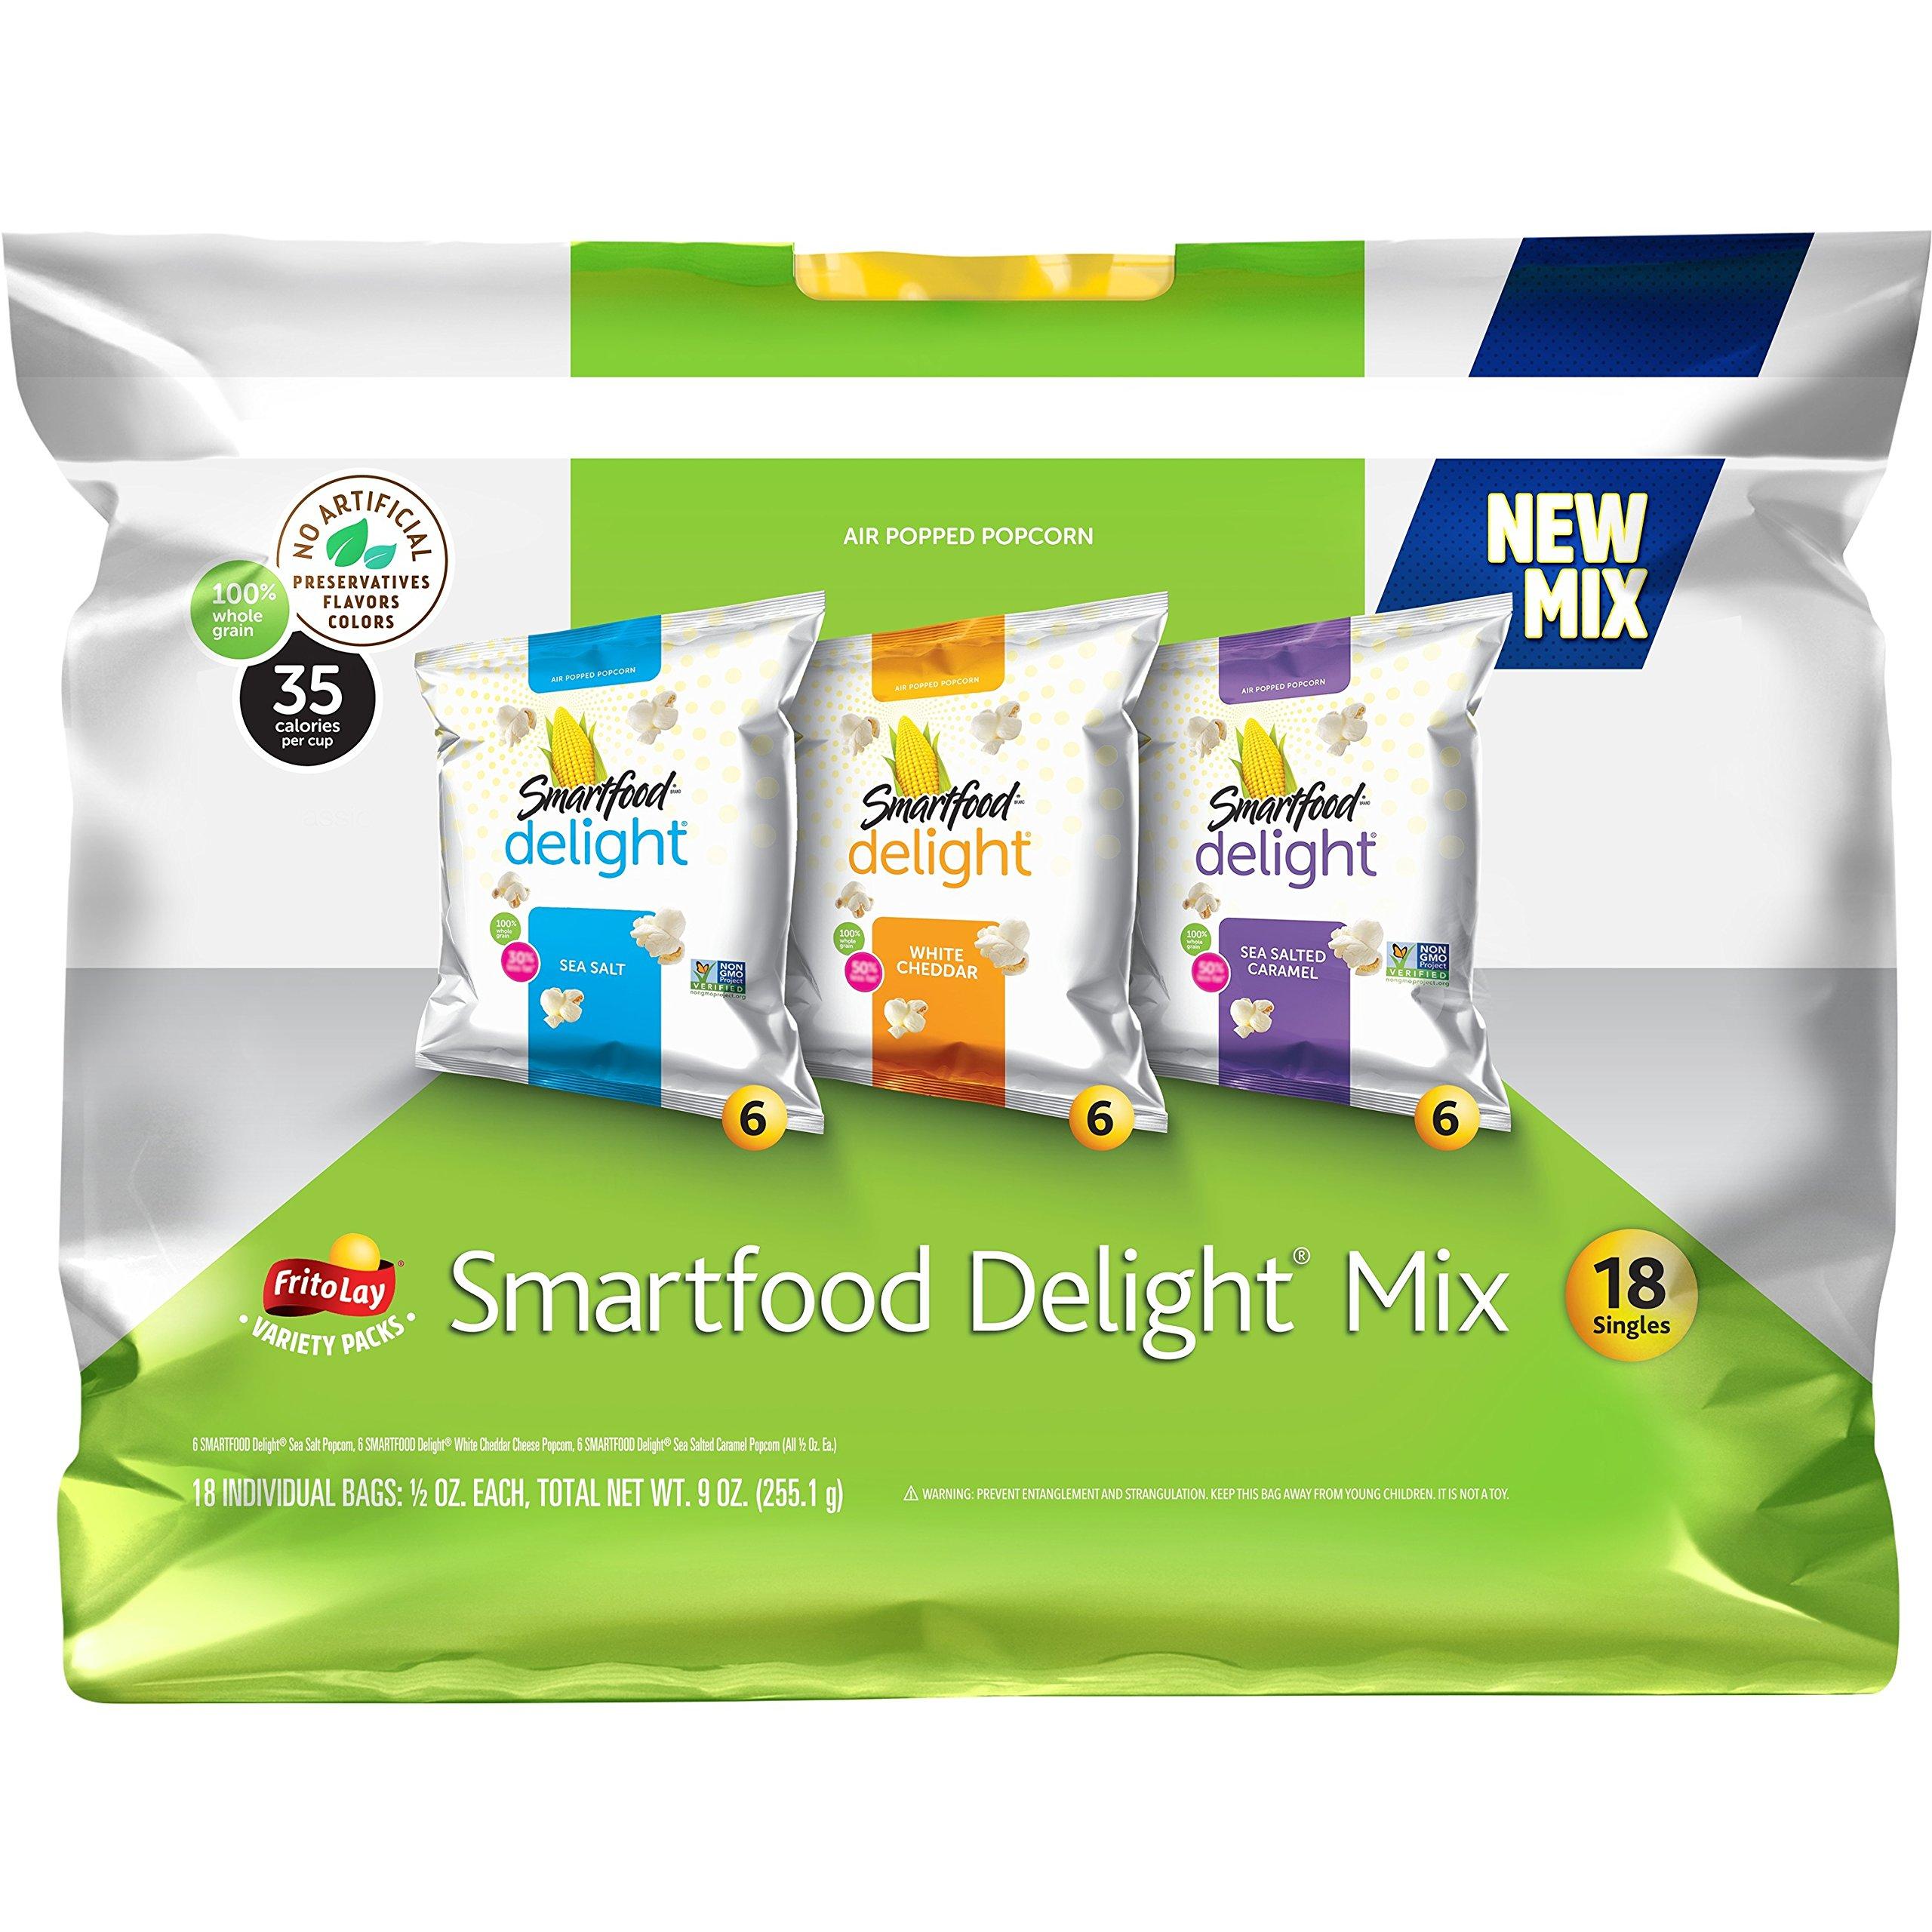 Smartfood Delight Popcorn Variety Pack, 18 Count